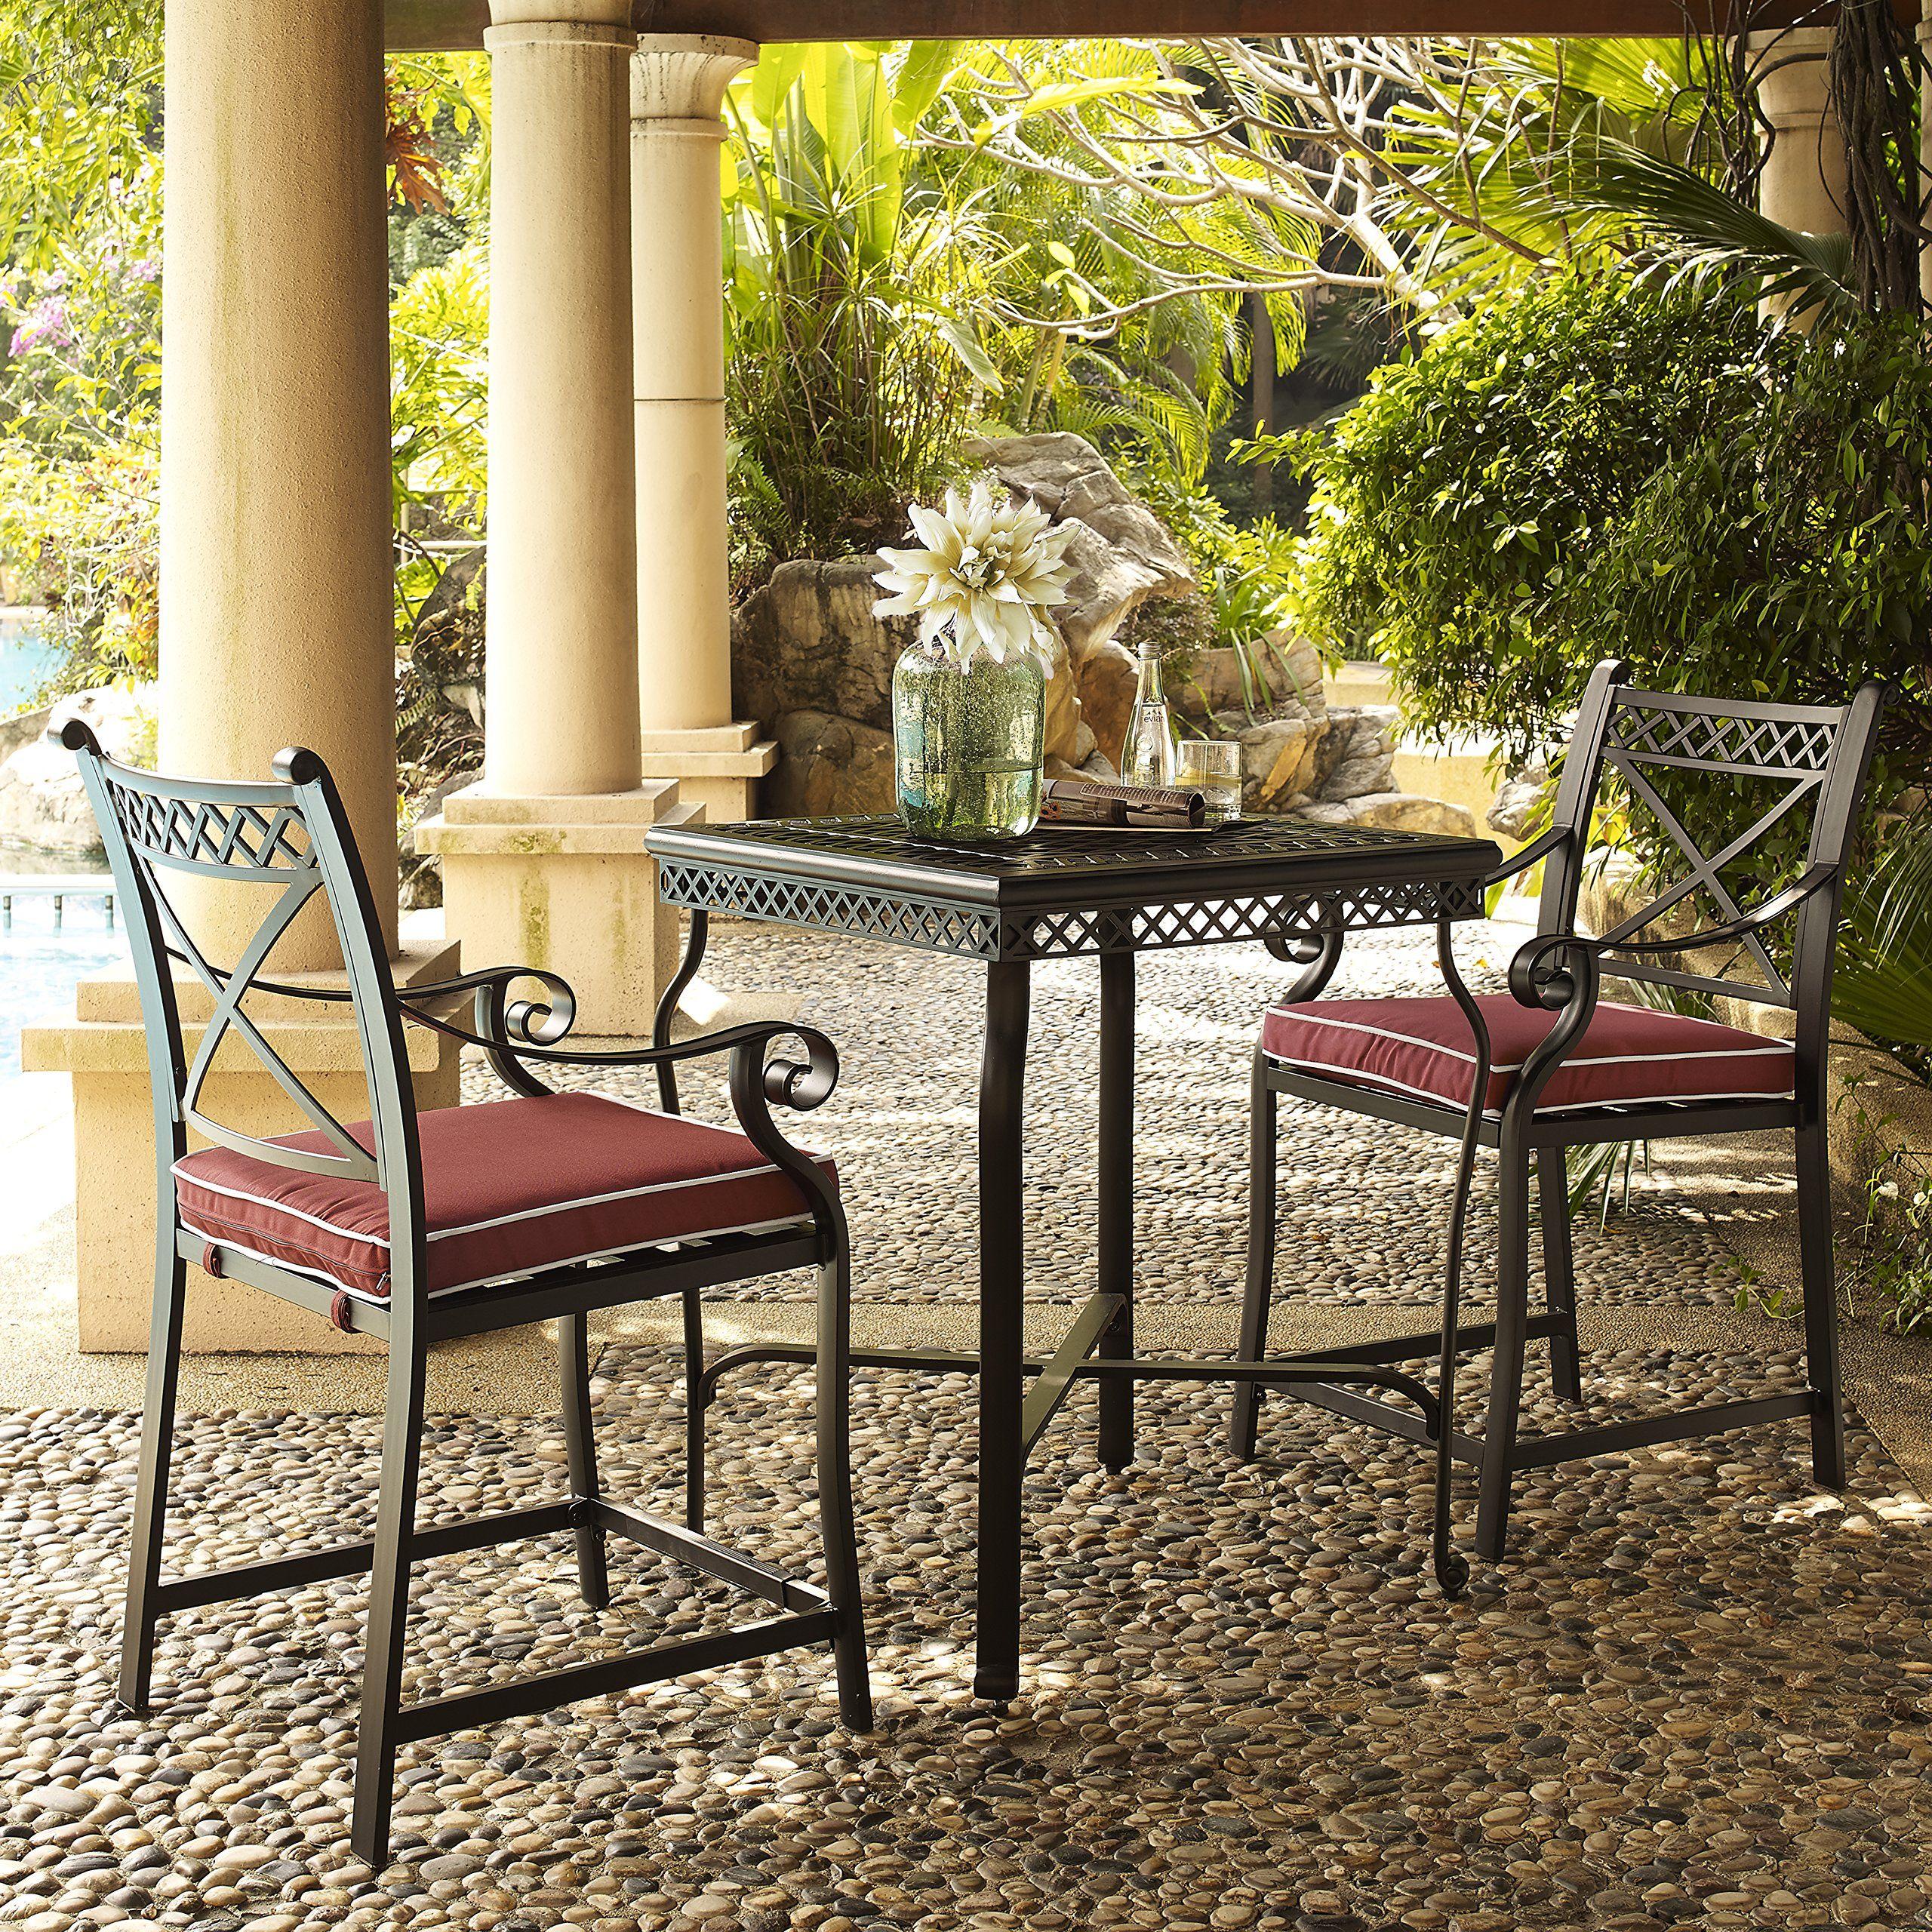 Charmant Crosley Furniture Portofino 3Piece Outdoor Aluminum BarHeight Bistro Set  With Sangria Cushions Black U003eu003eu003e Read More Reviews Of The Product By  Visiting The ...